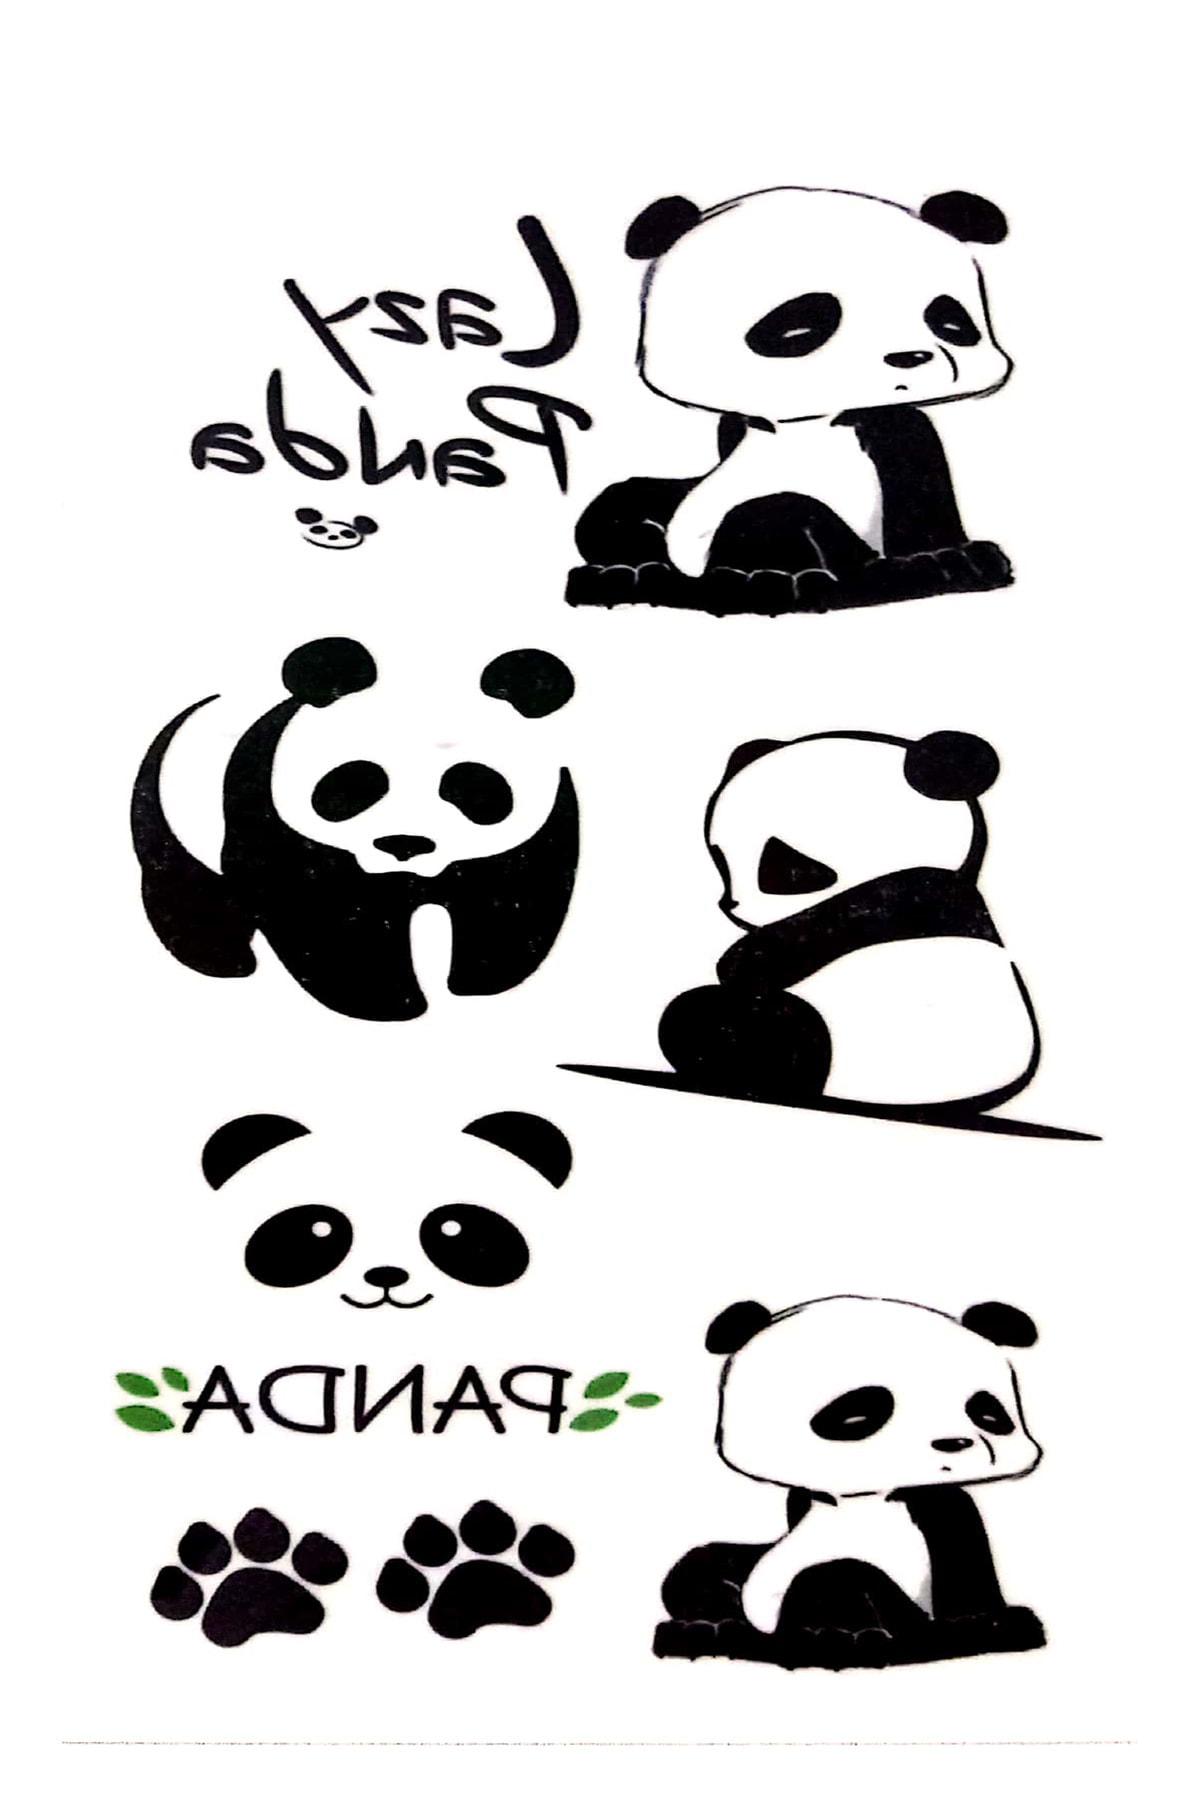 Parti dolabı Tattoo Geçici Dövme Sevimli Panda 1